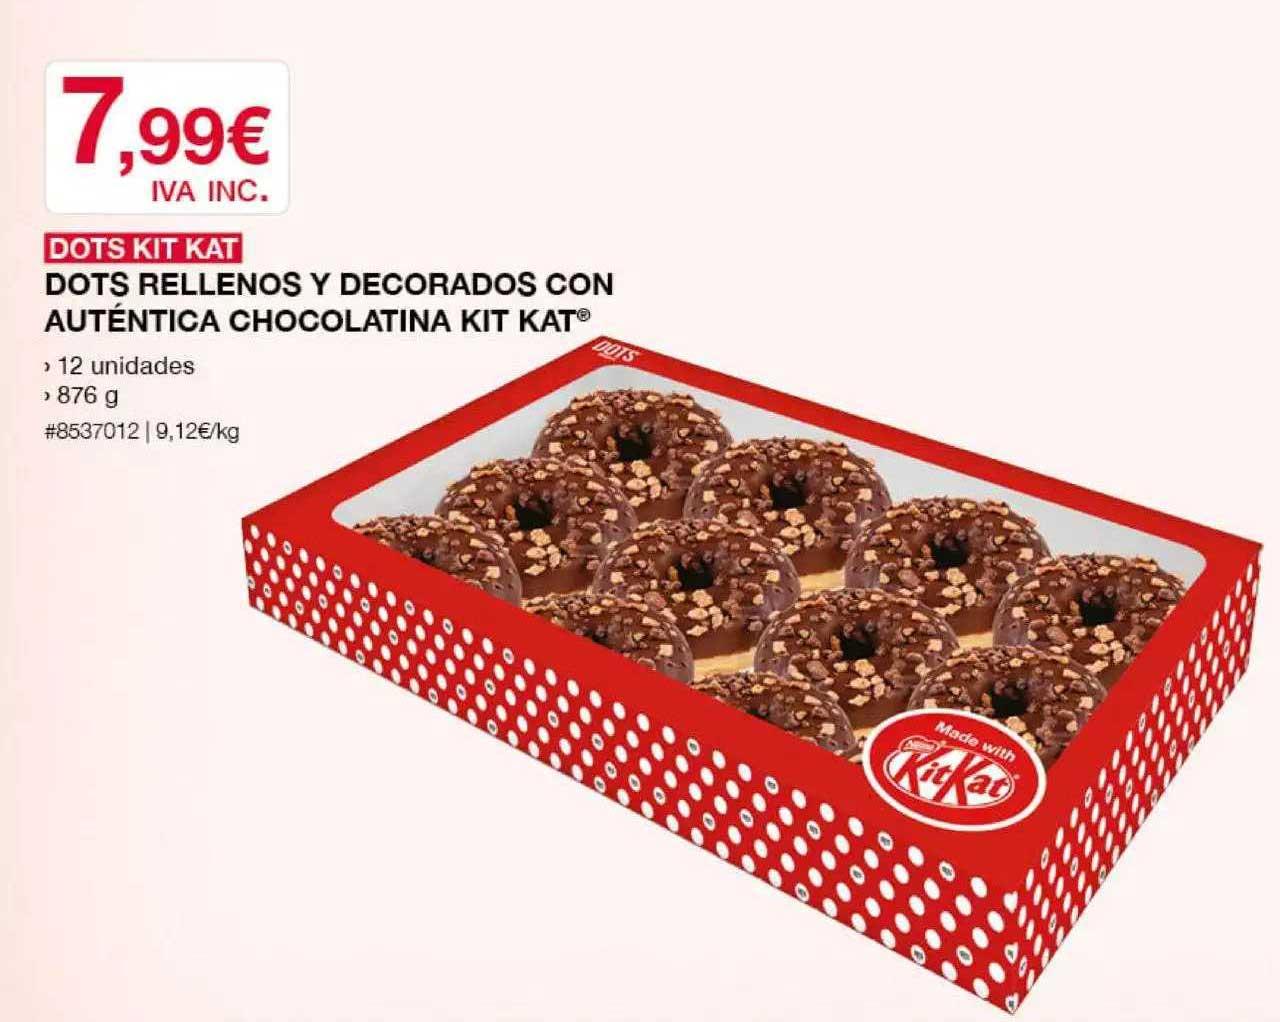 Costco Dots Kit Kat Dots Rellenos Y Decorados Con Auténtica Chocolatina Kit Kat